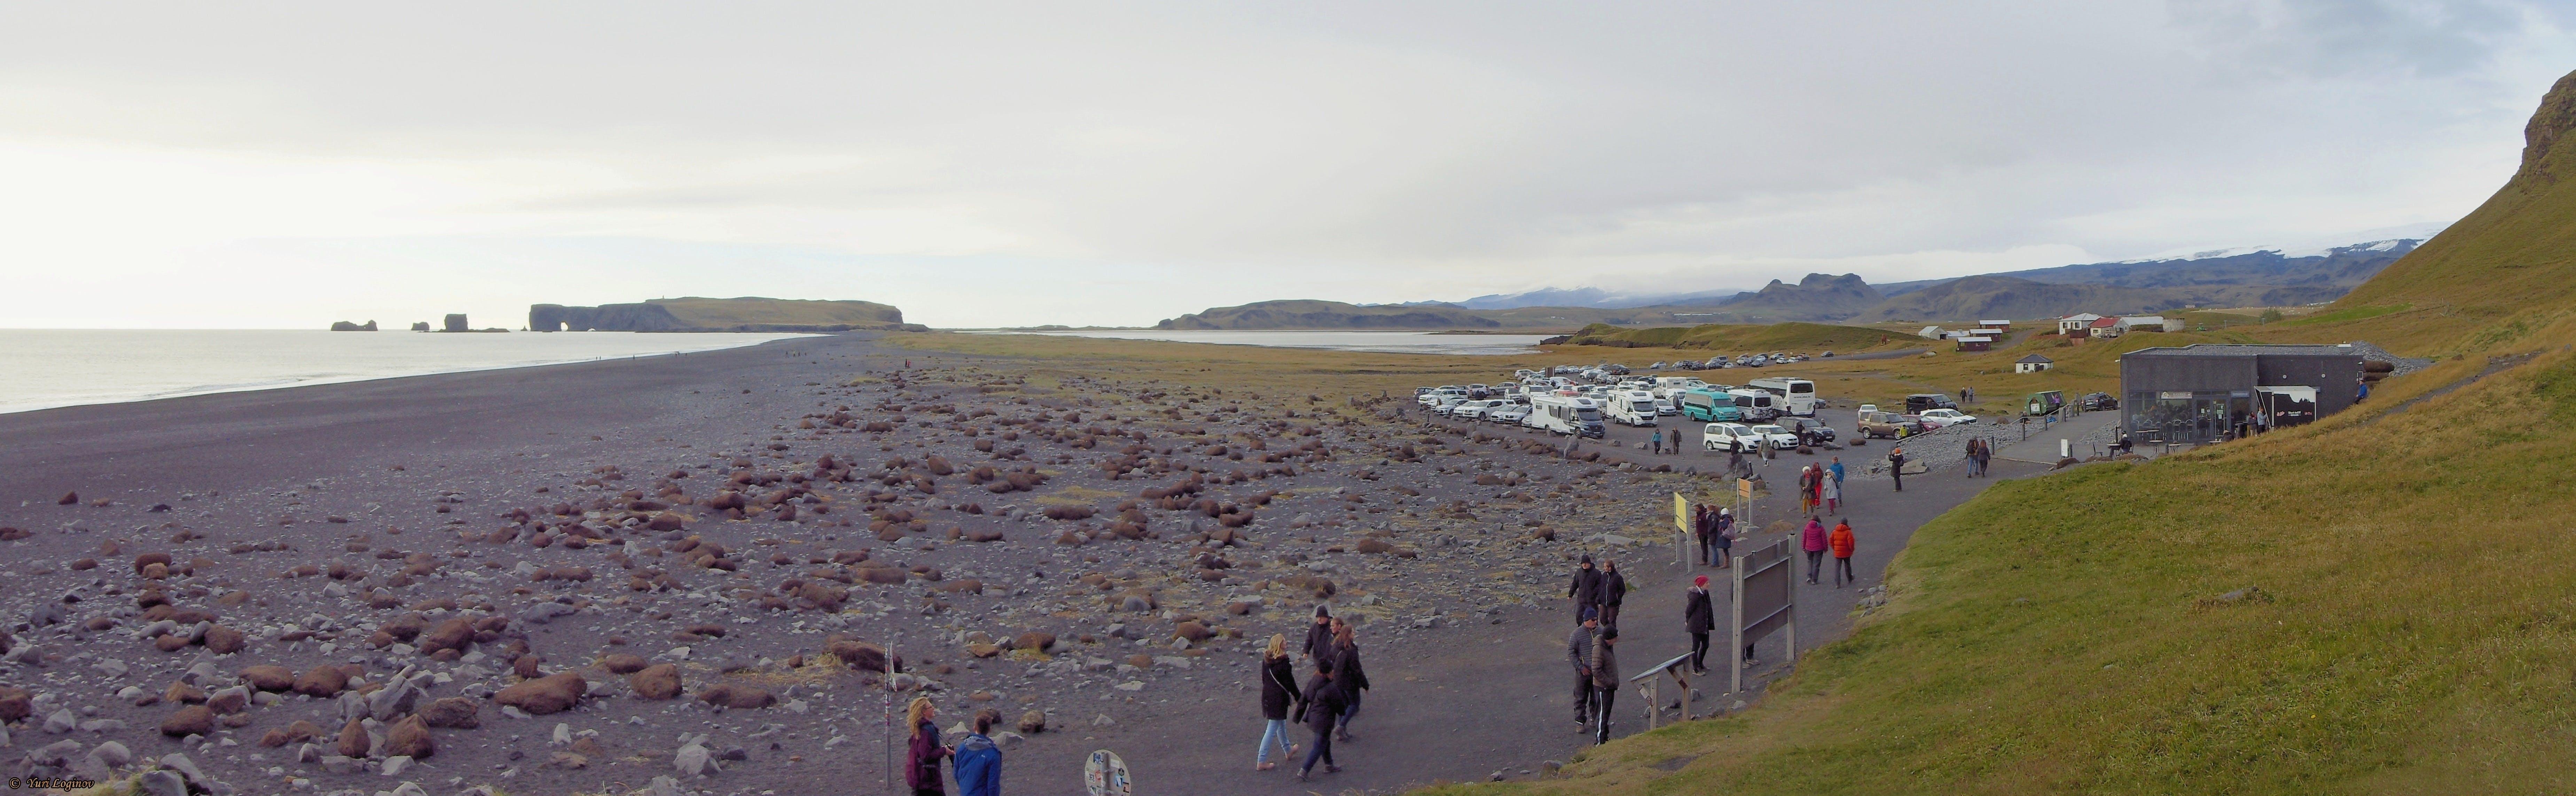 Free stock photo of Dyrhólaey, iceland